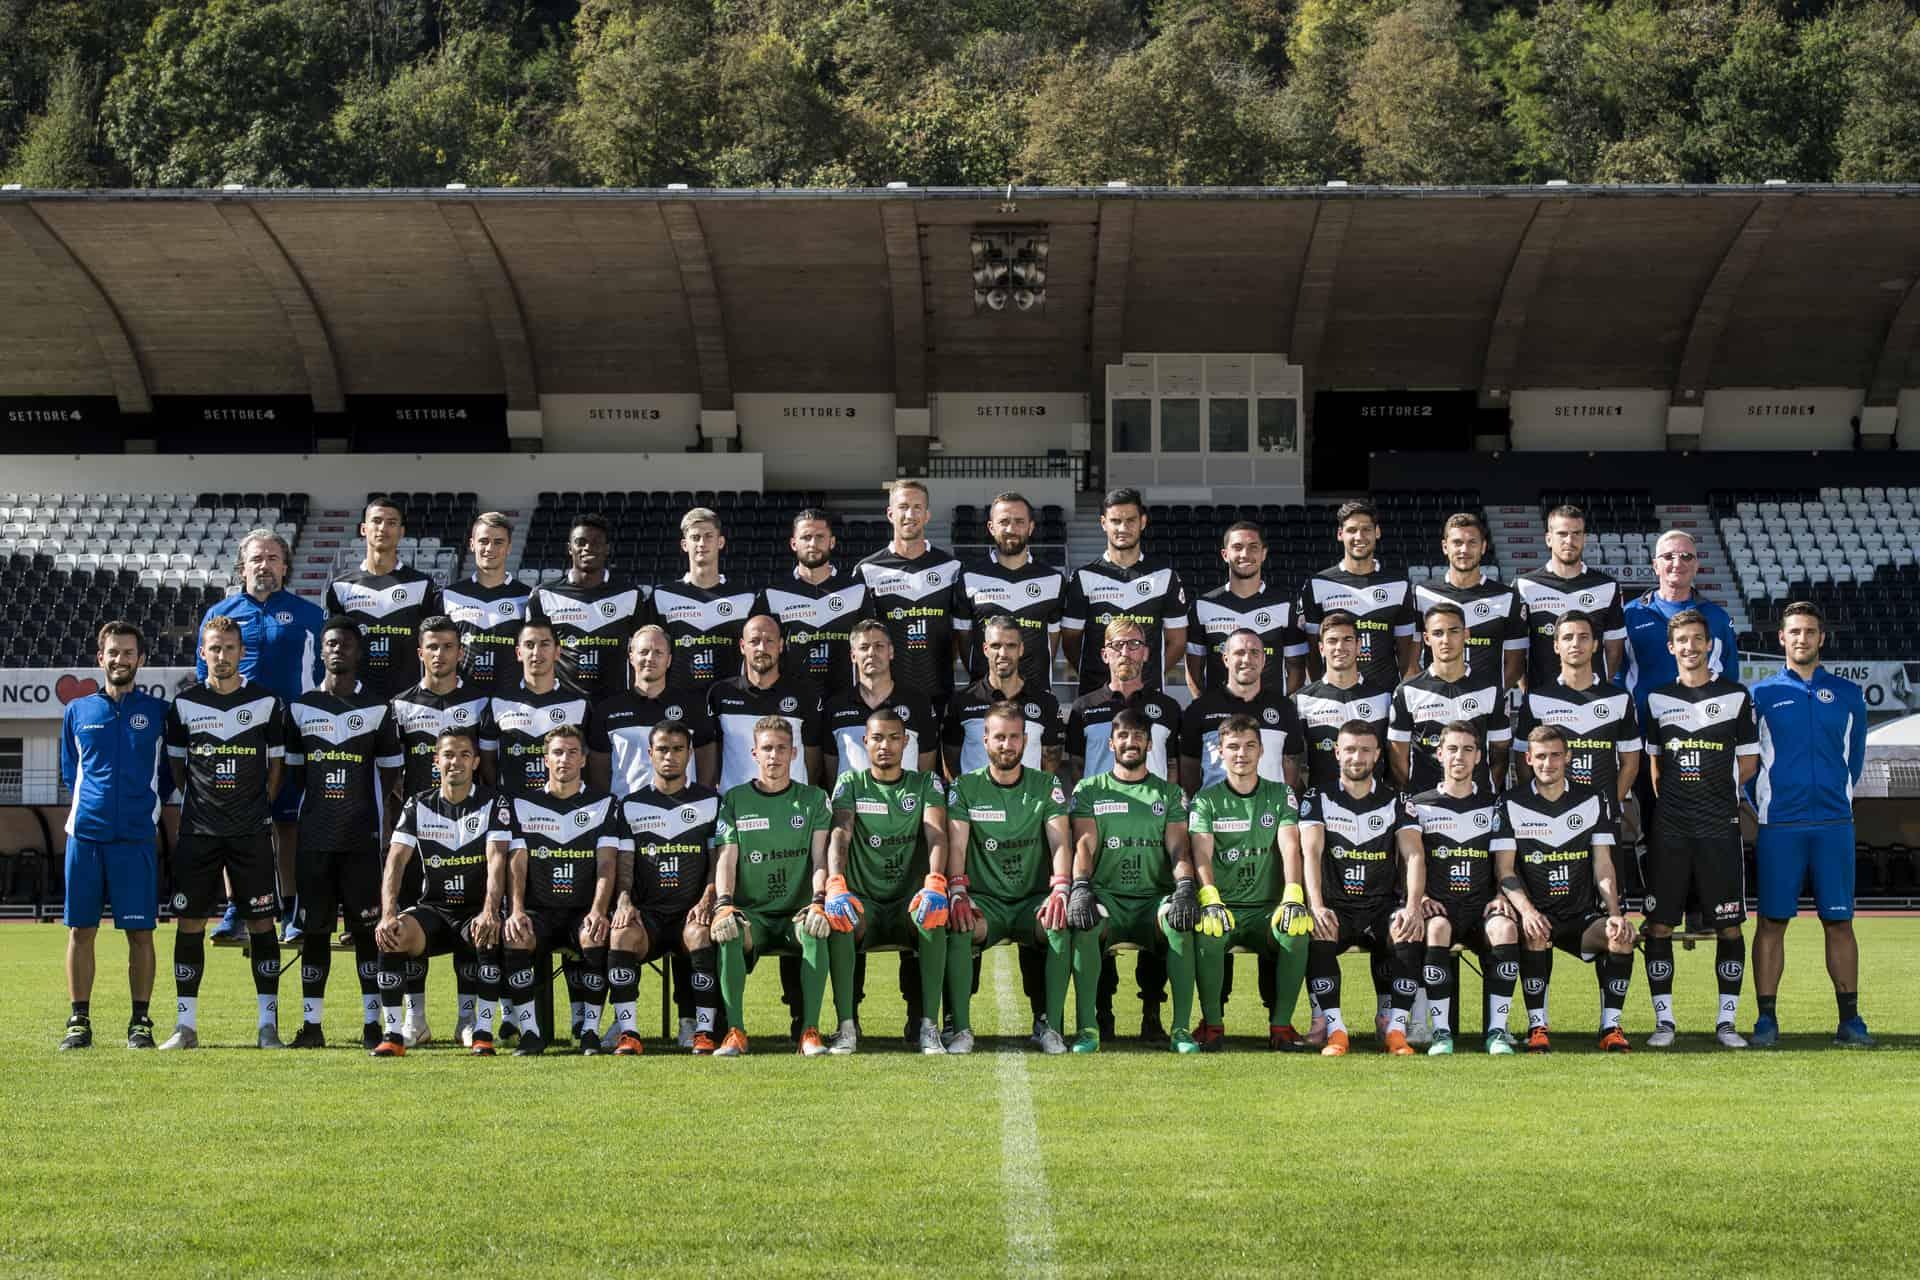 Squadra 2018-19 FC Lugano